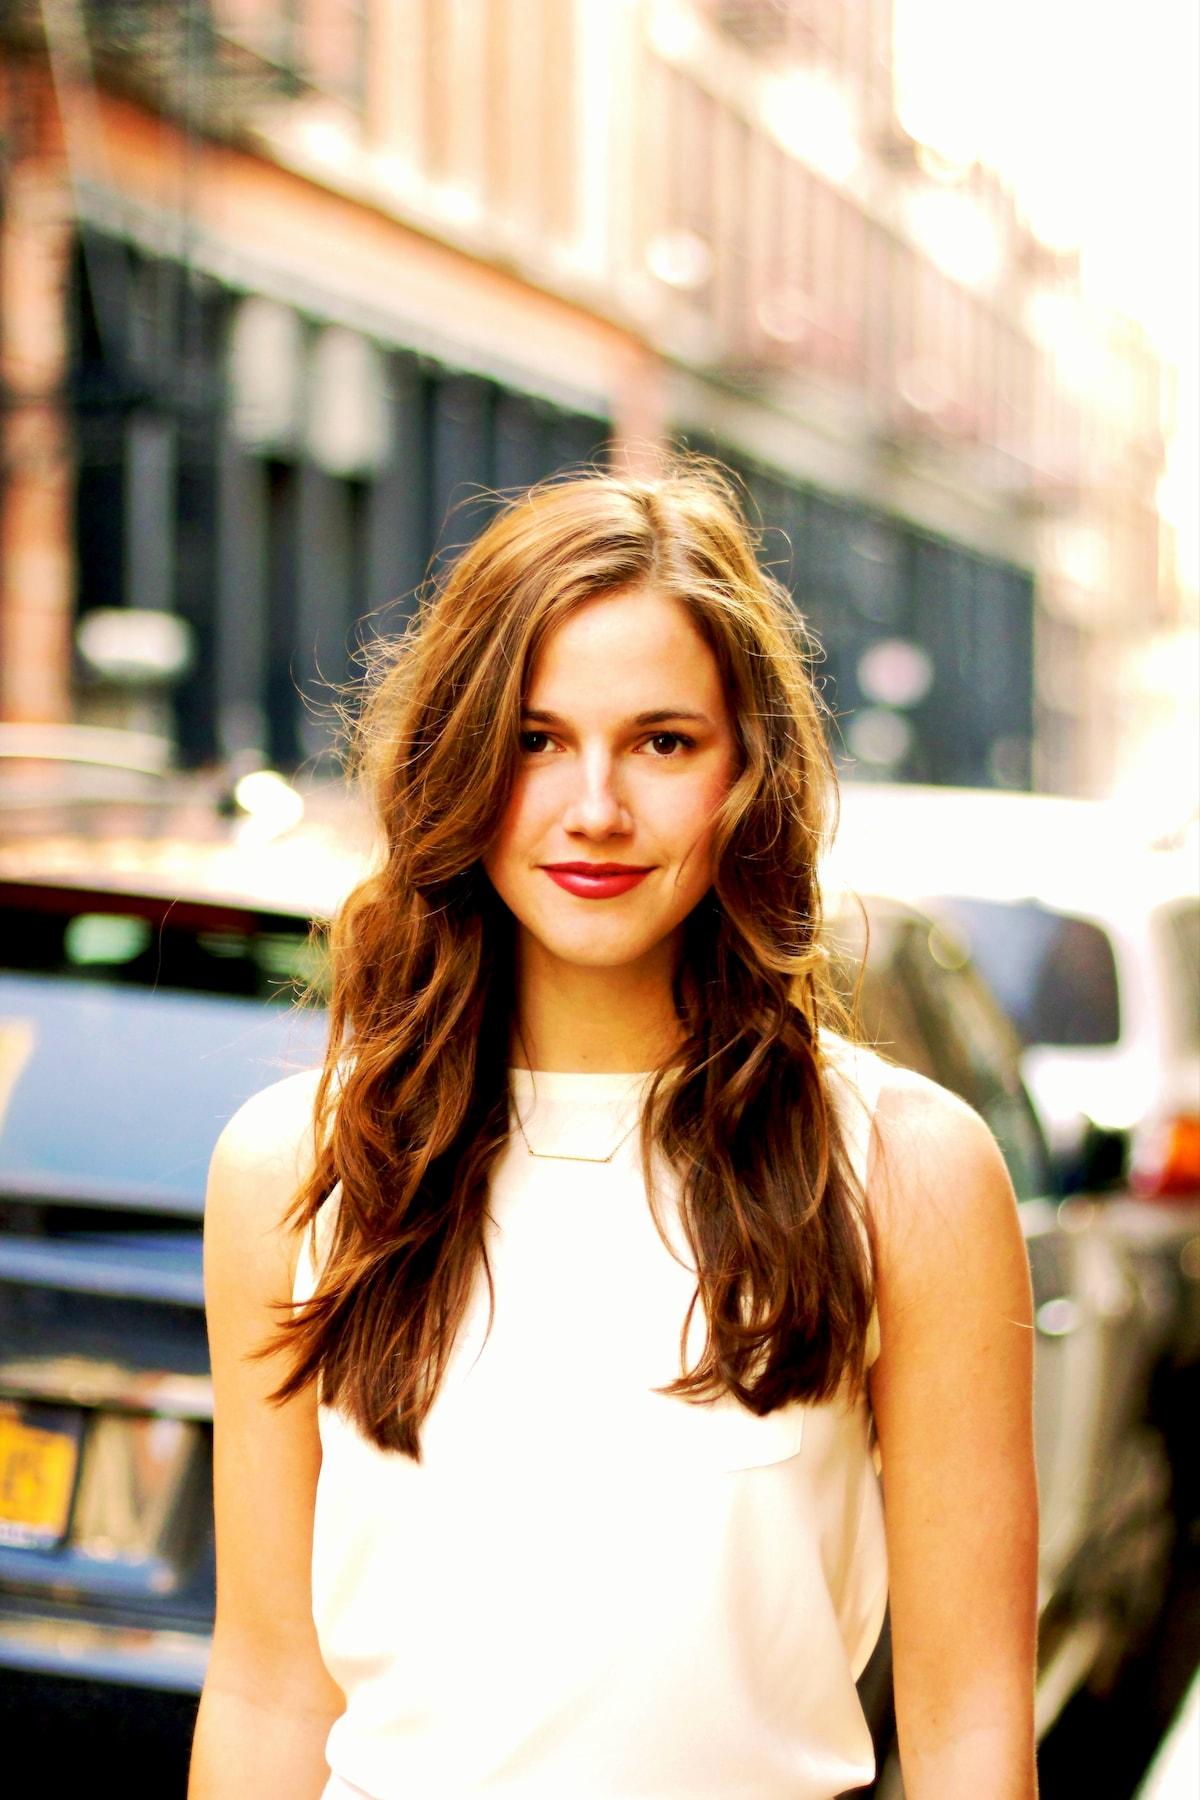 Raquel from New York